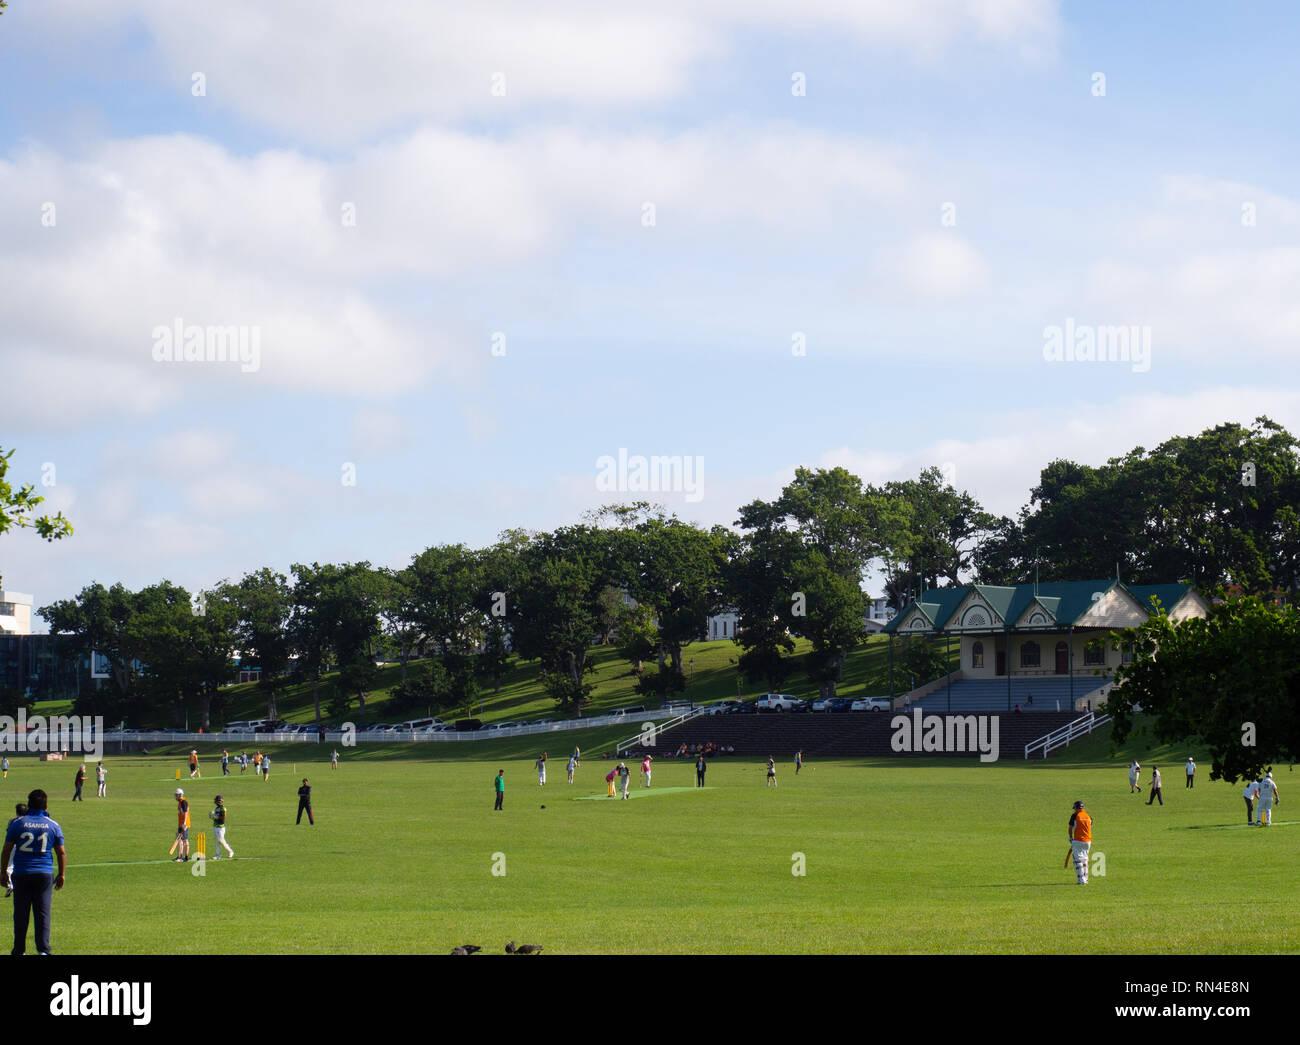 A Social Cricket Game In Progress - Stock Image